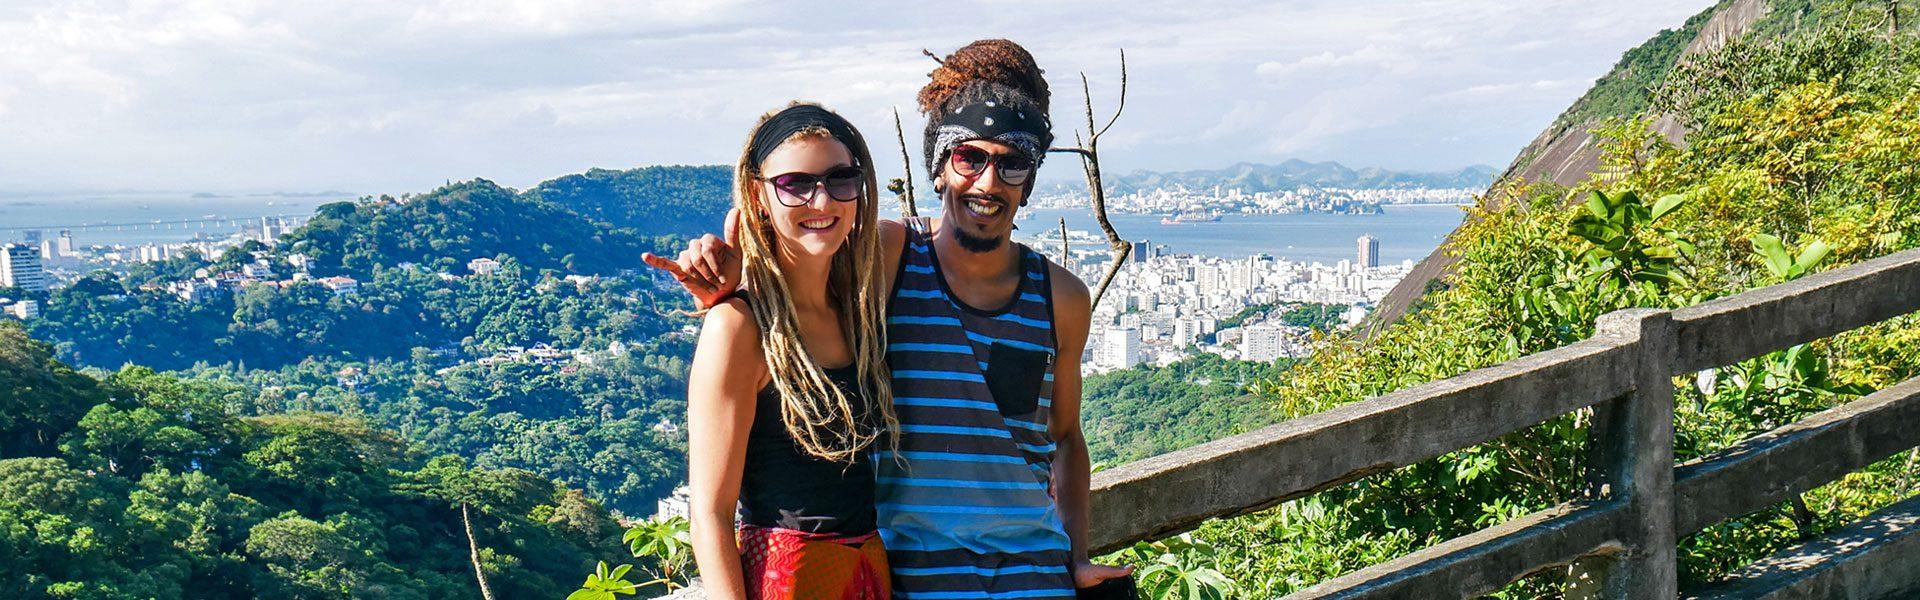 Rasta couple on Corcovado mountain in Tijuca Forest National Park overlooking Rio de Janeiro, Brazil